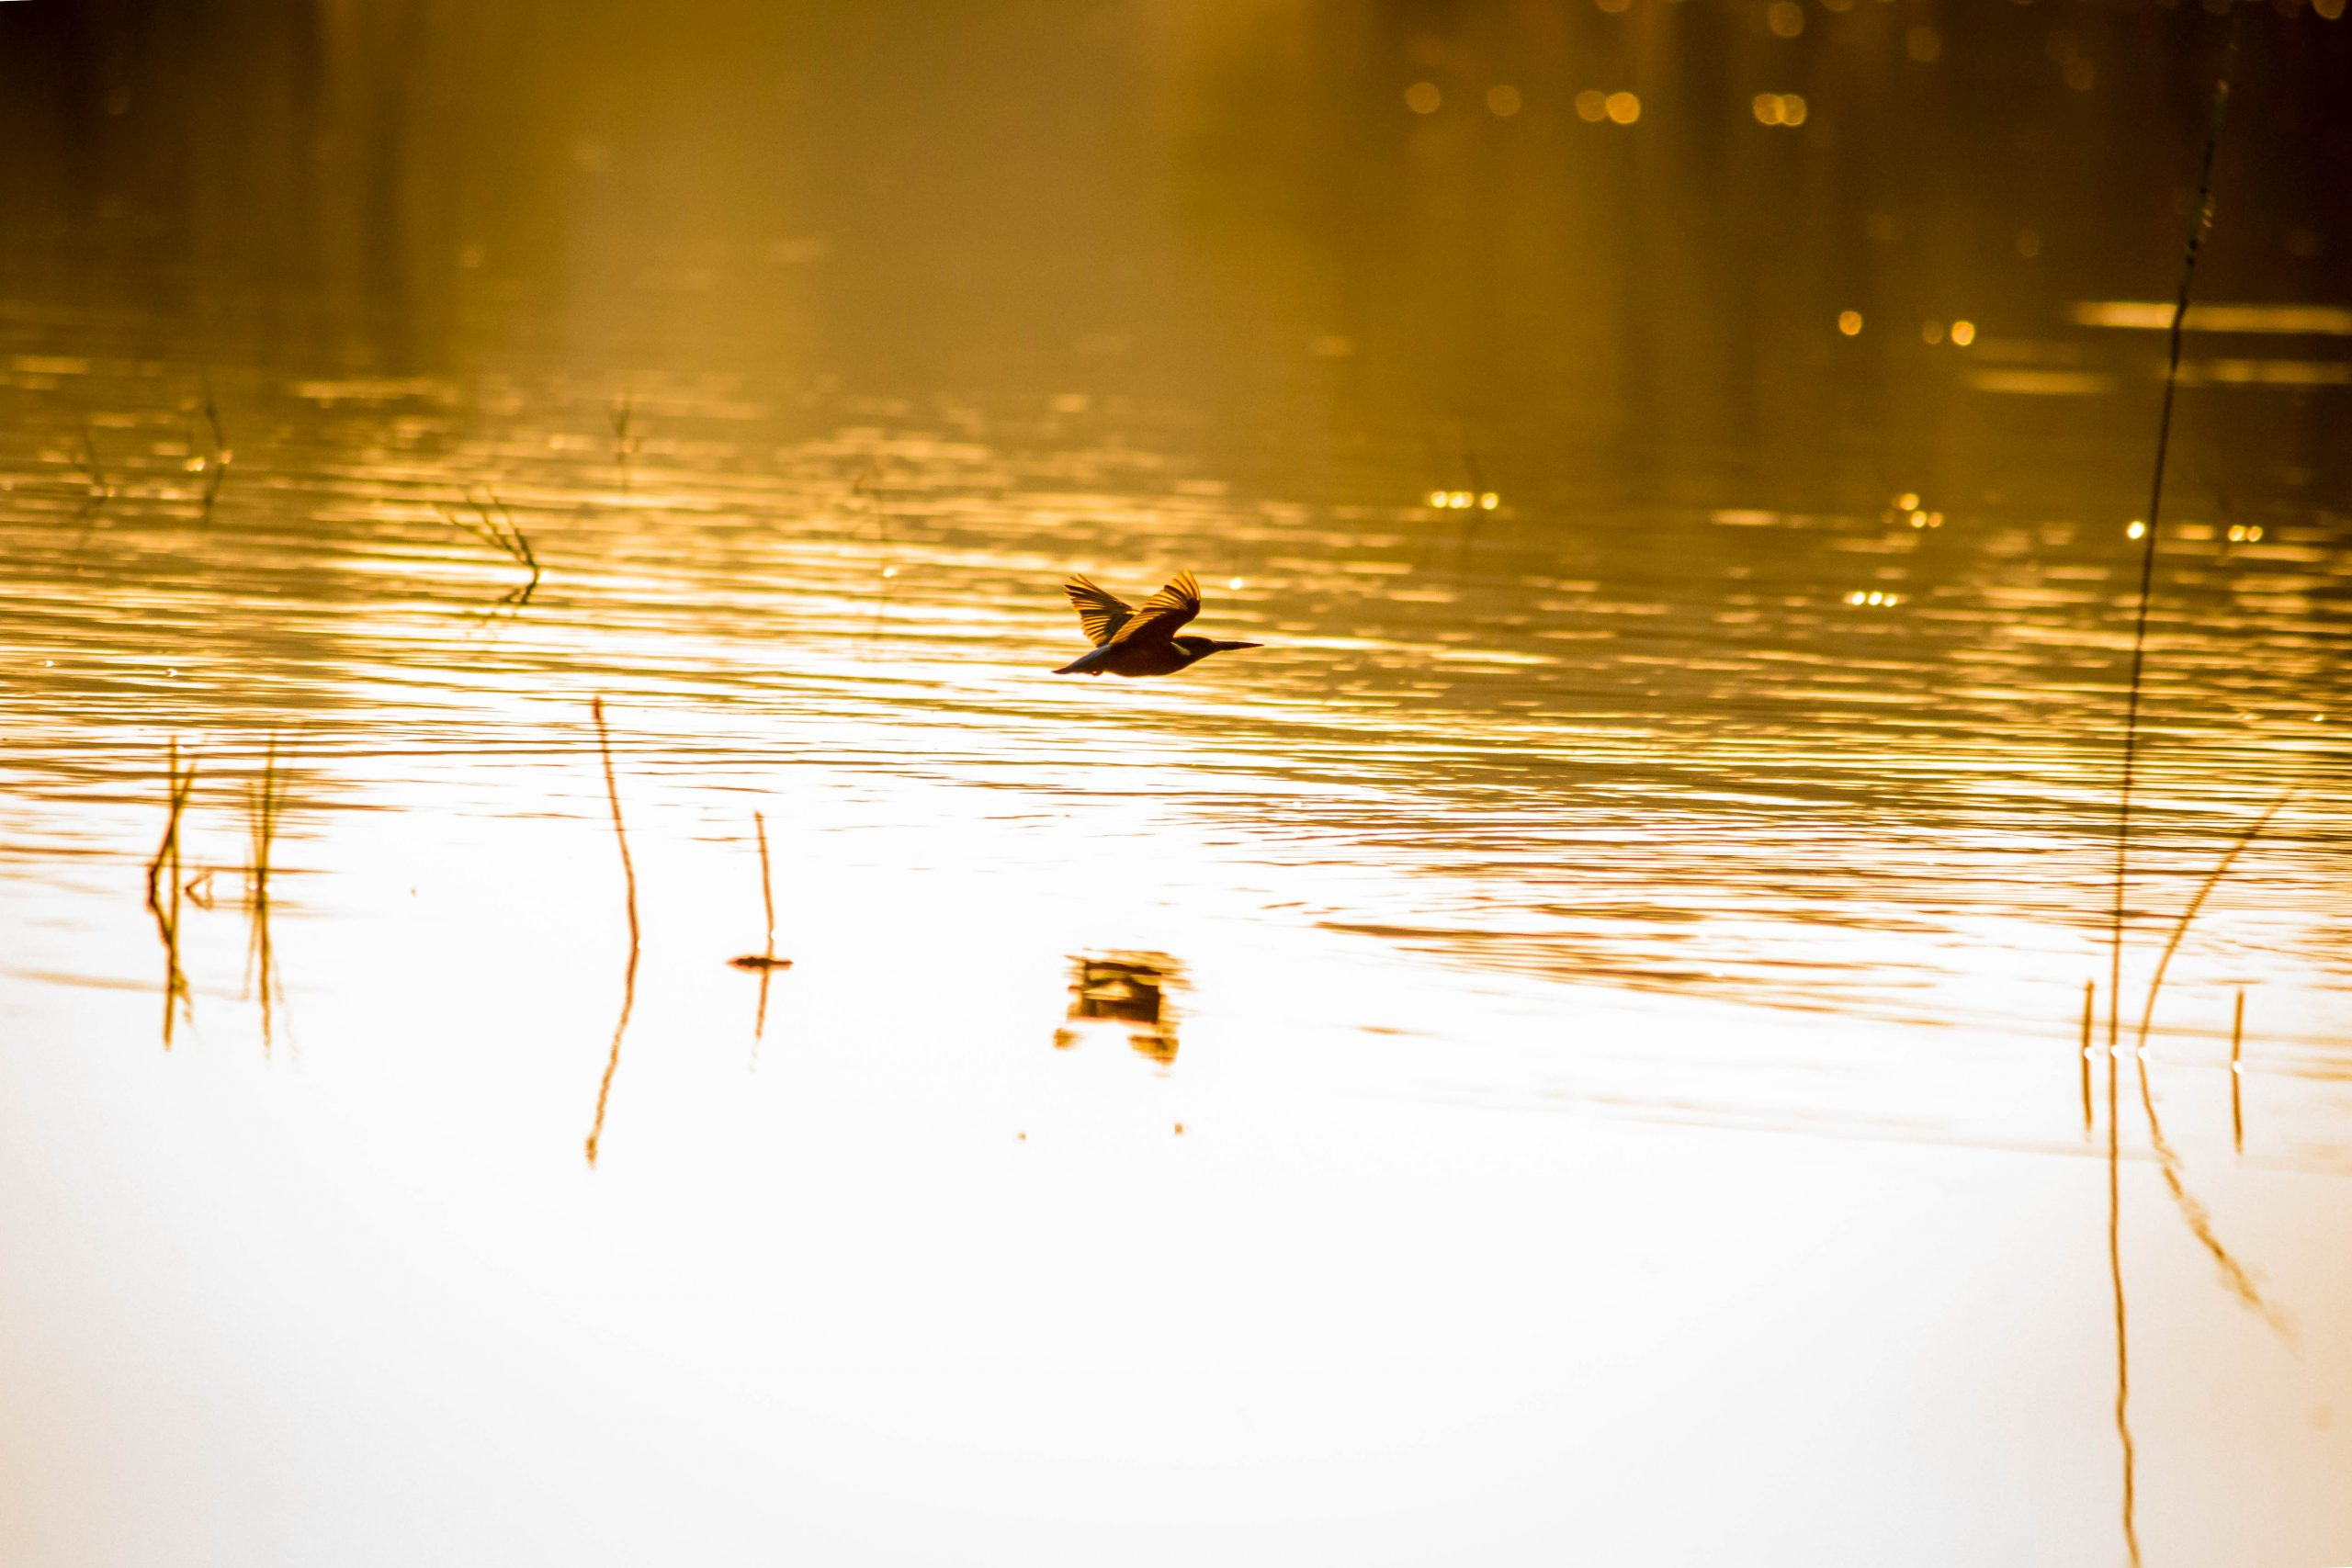 A bird flying on a pond